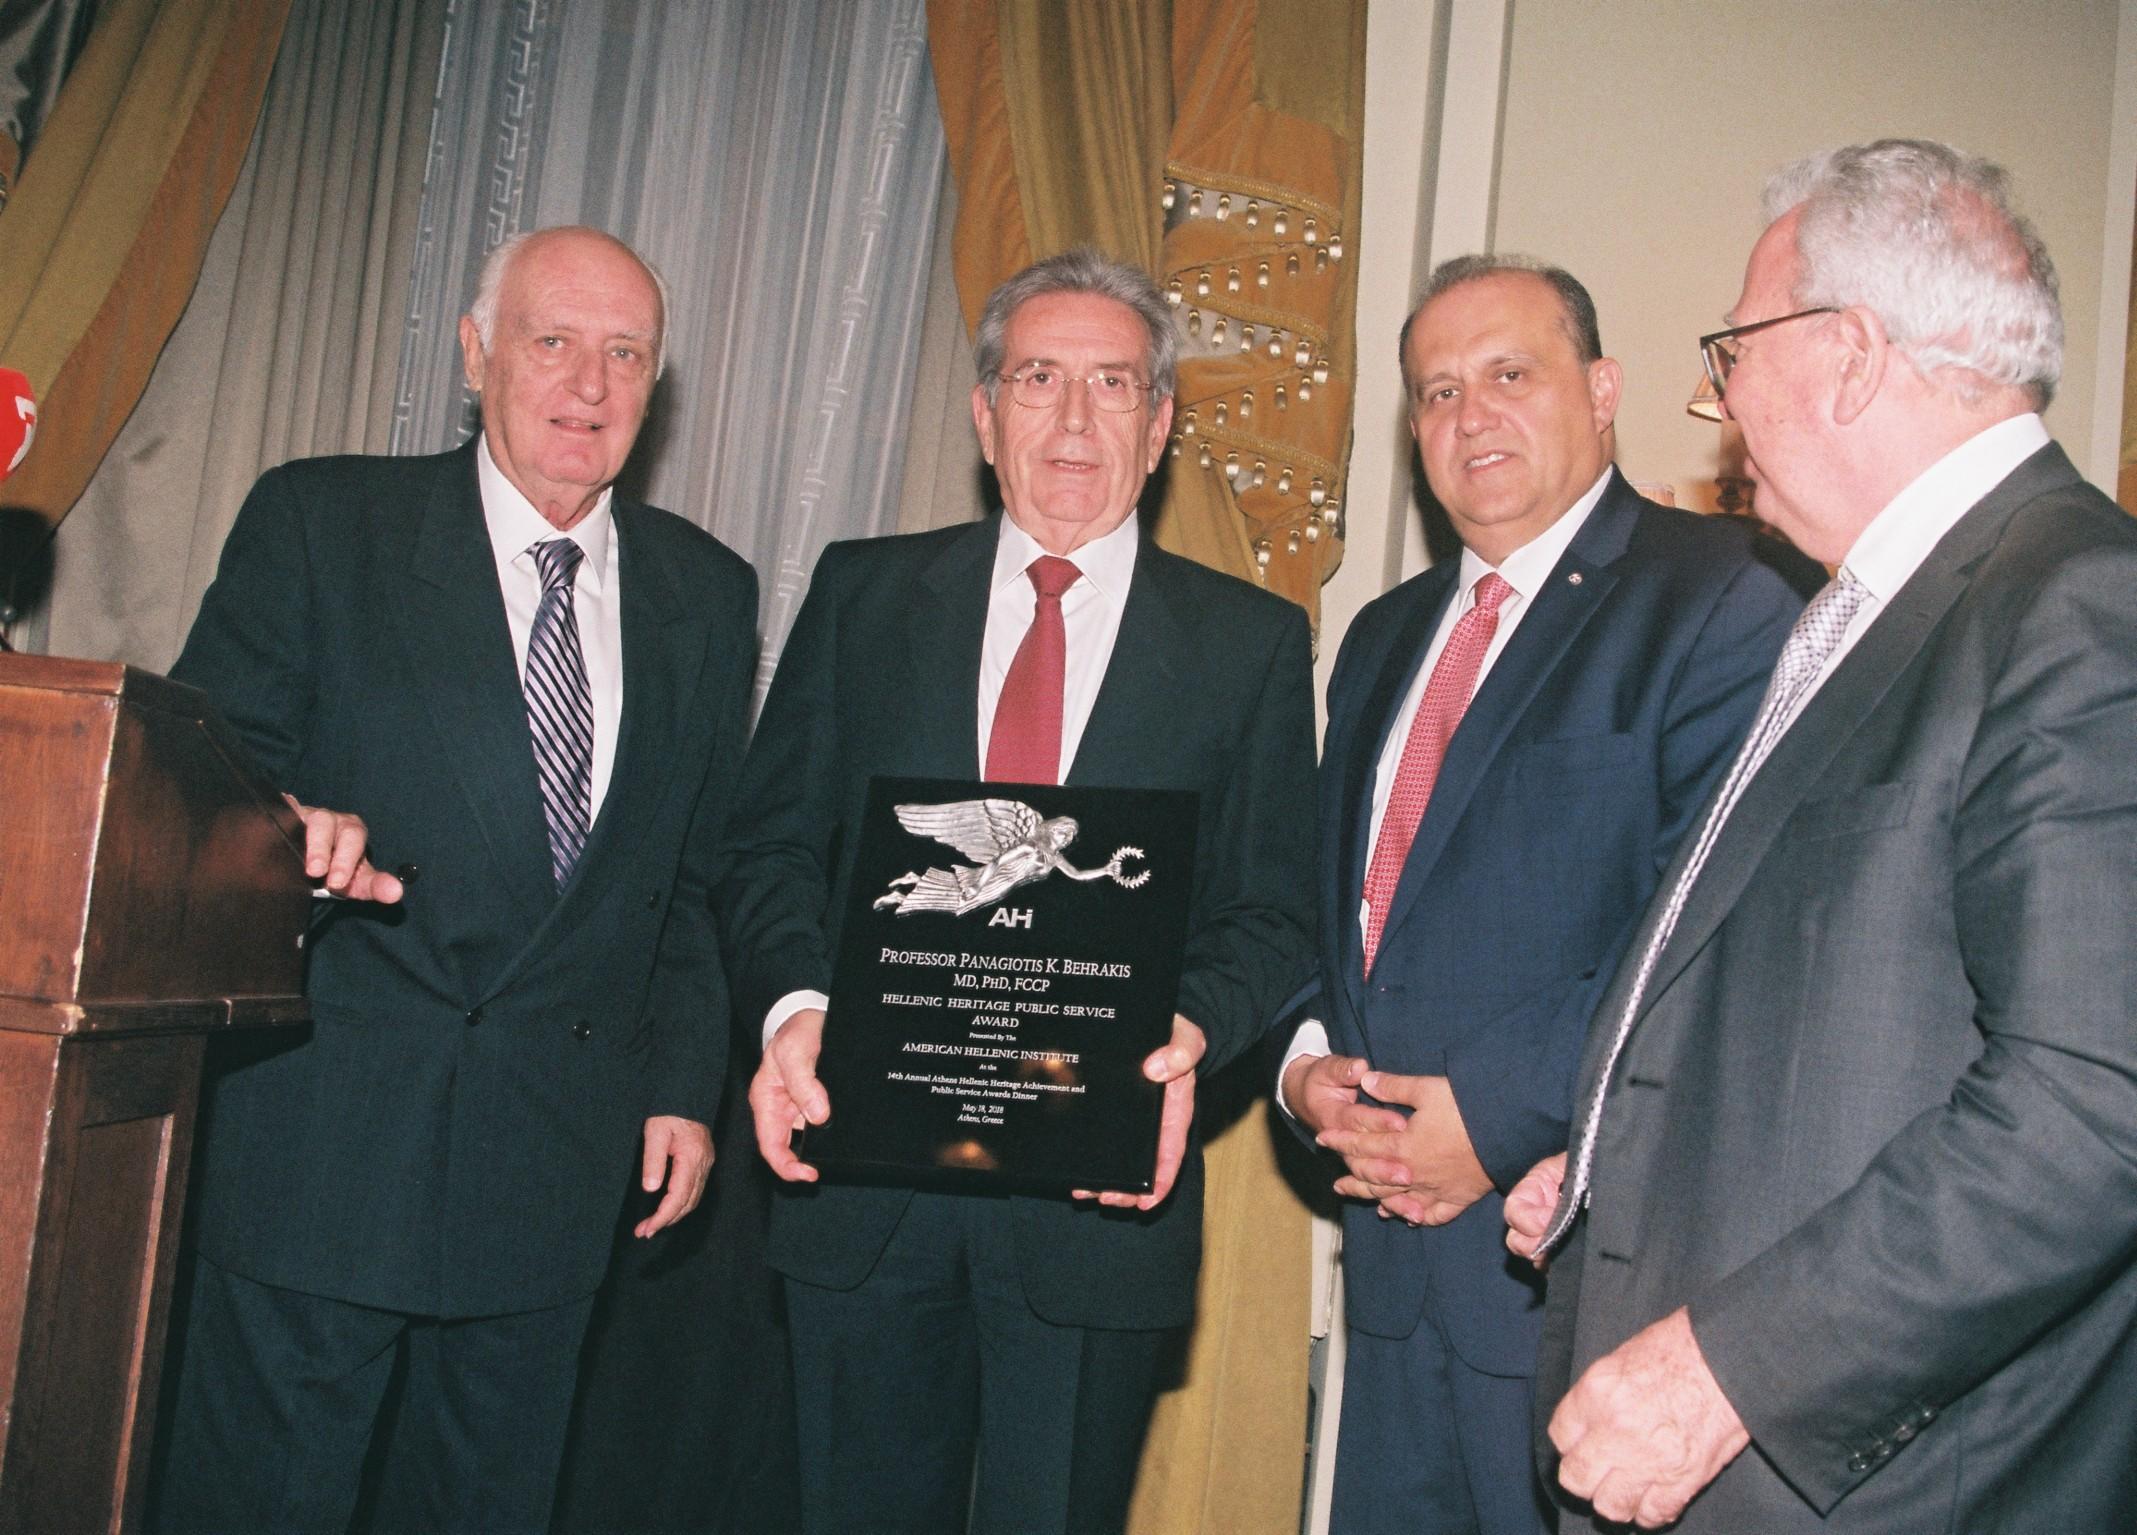 Dr. Behrakis accepts the AHI Hellenic Heritage Public Service Award.